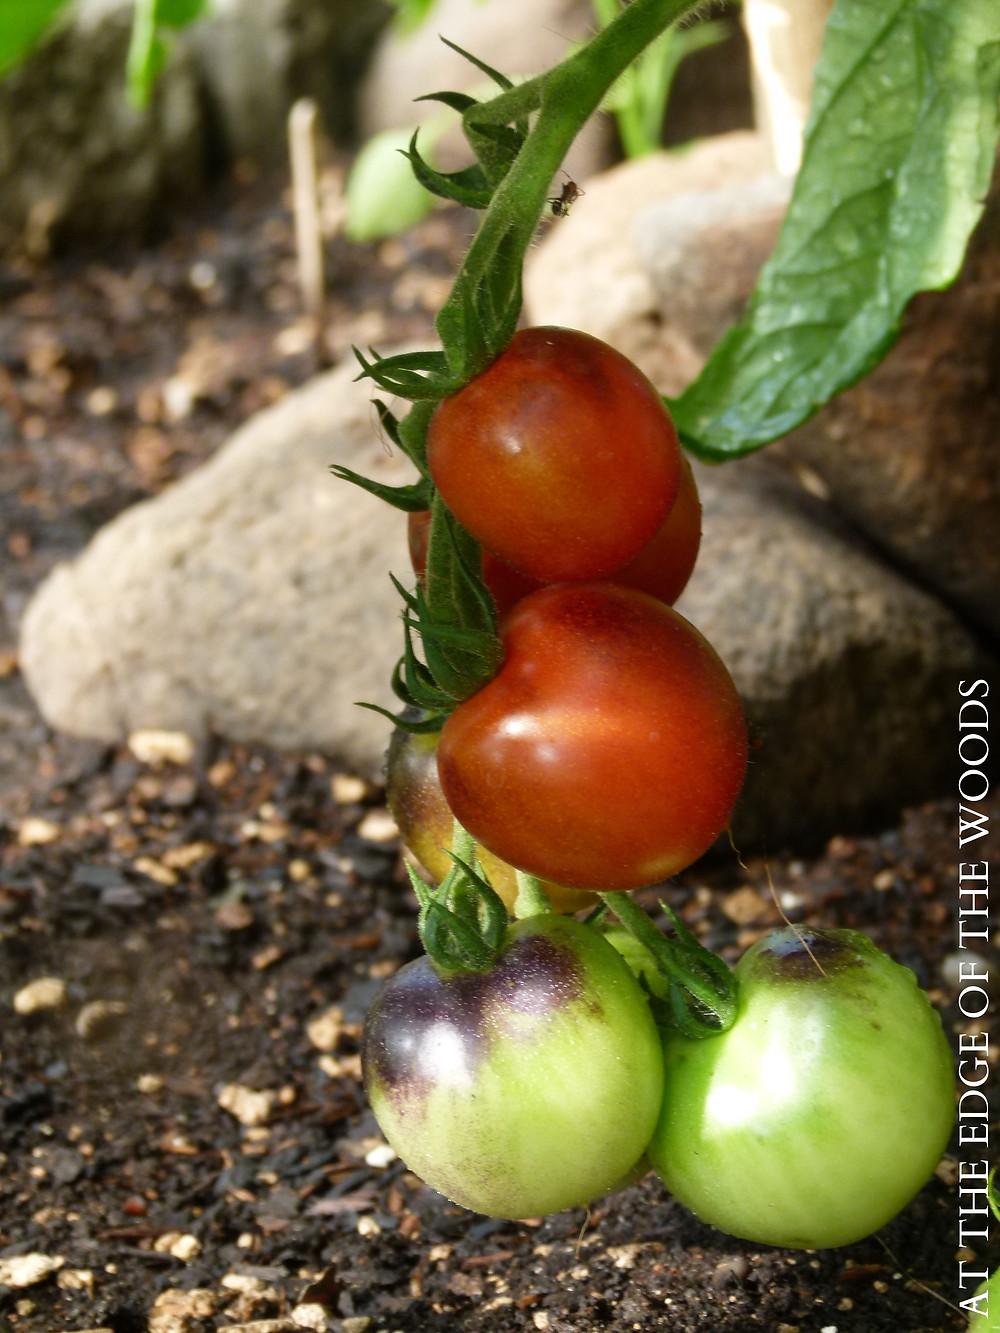 Indigo Cherry tomatoes